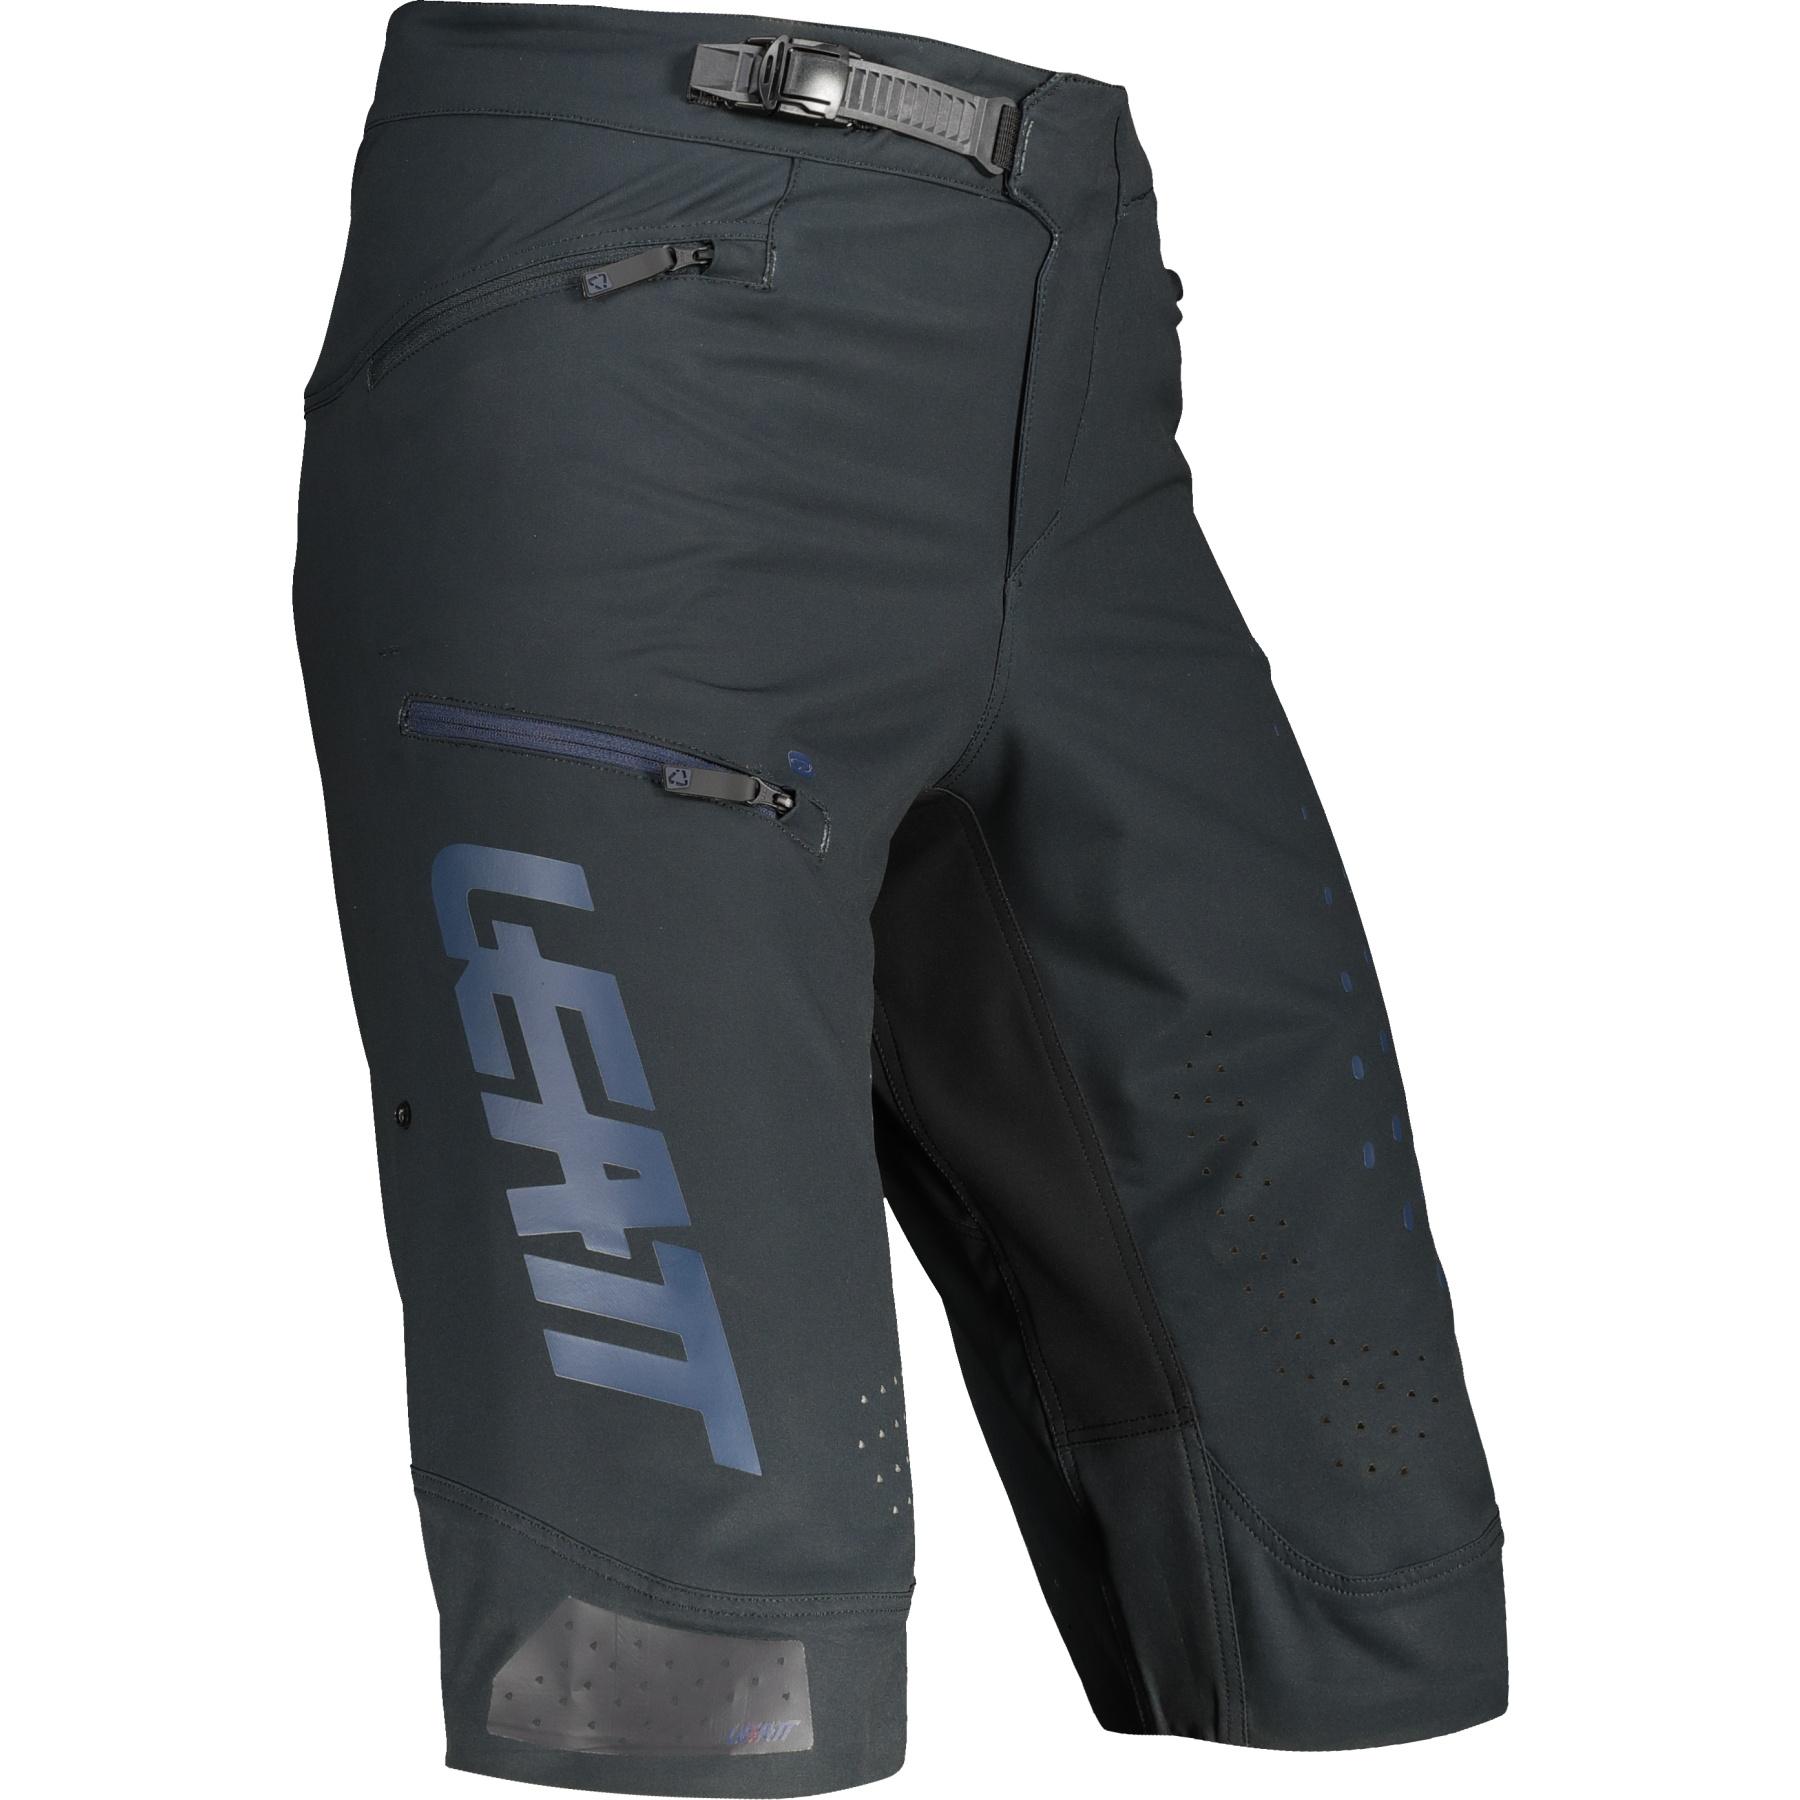 Leatt DBX 4.0 Shorts - black